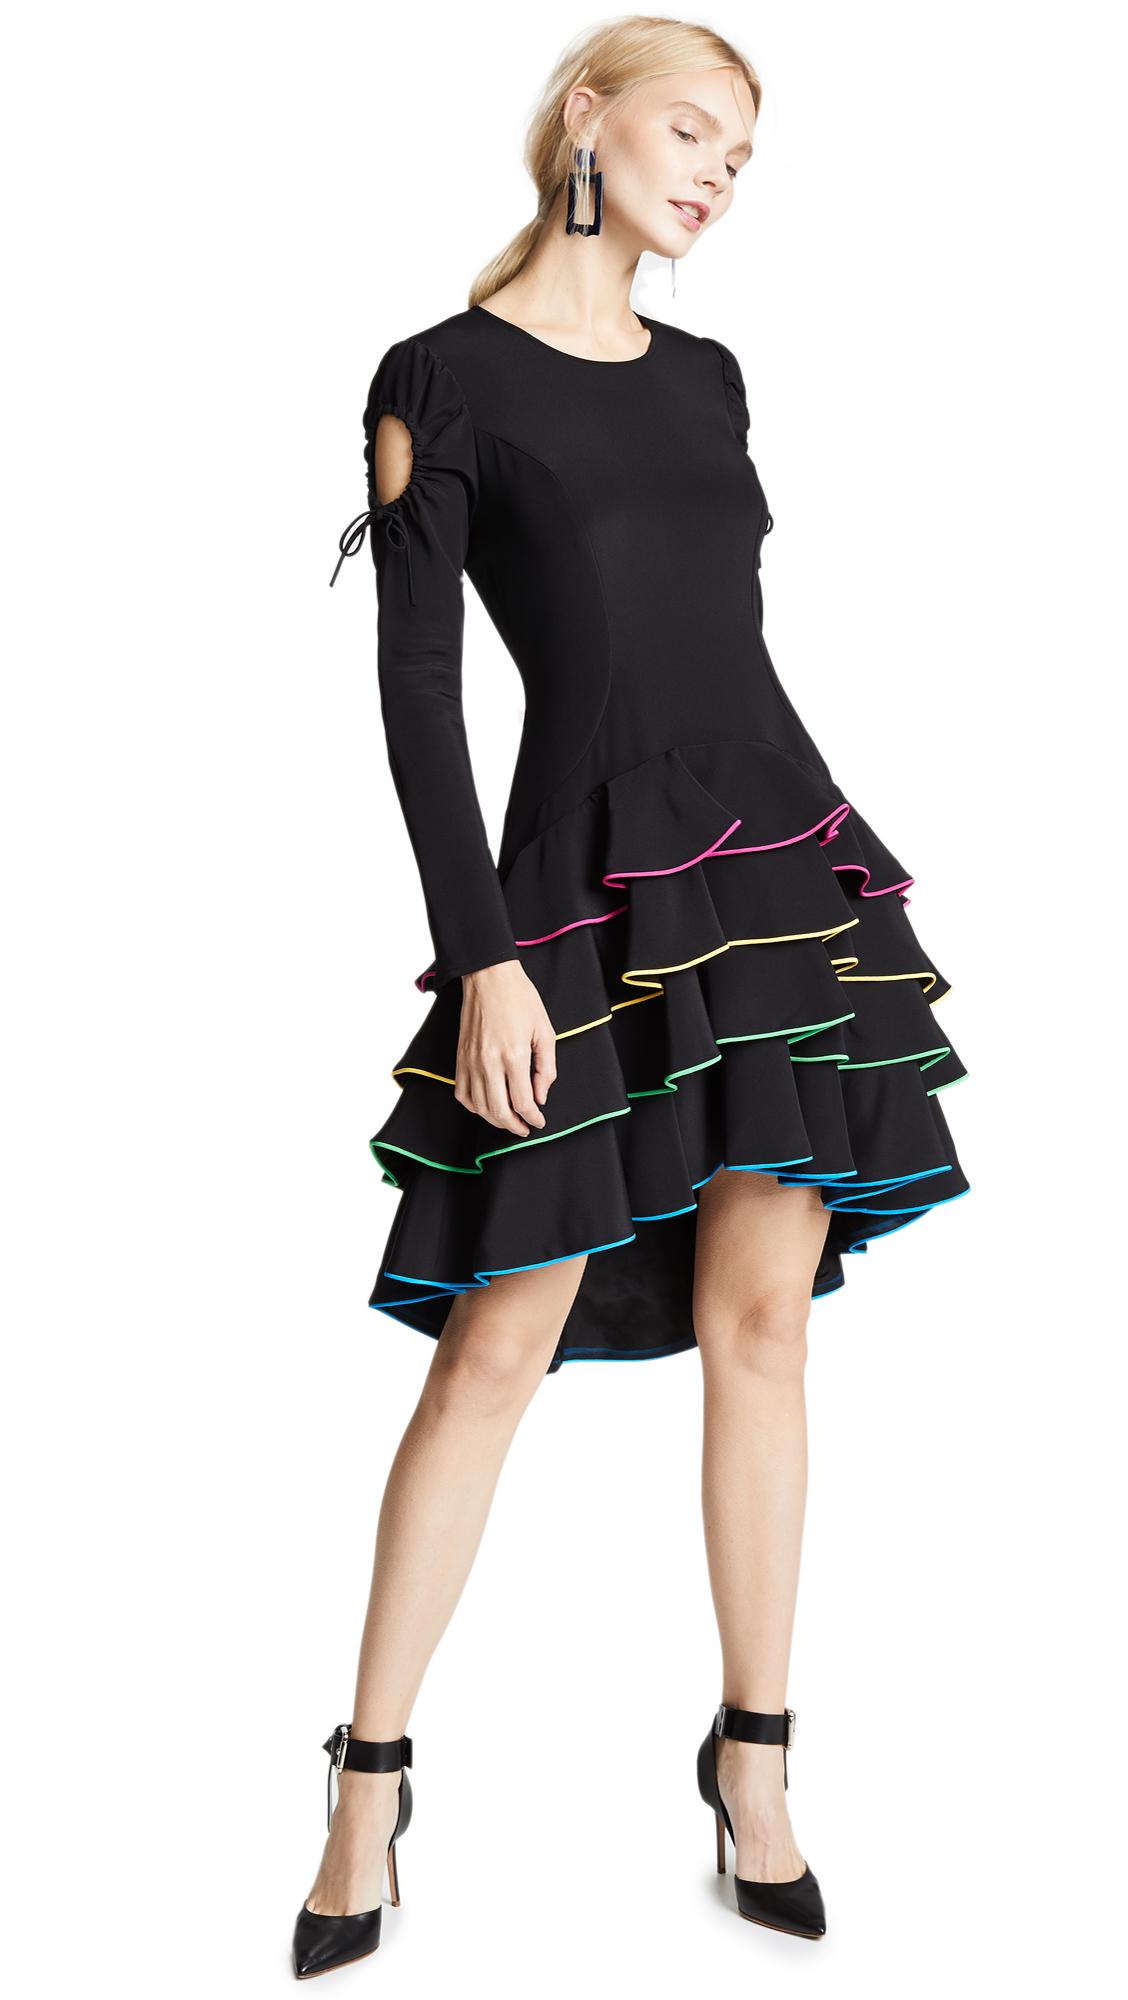 Viva Aviva Adora Tiered Corded Ruffle Dress In Black/Multi